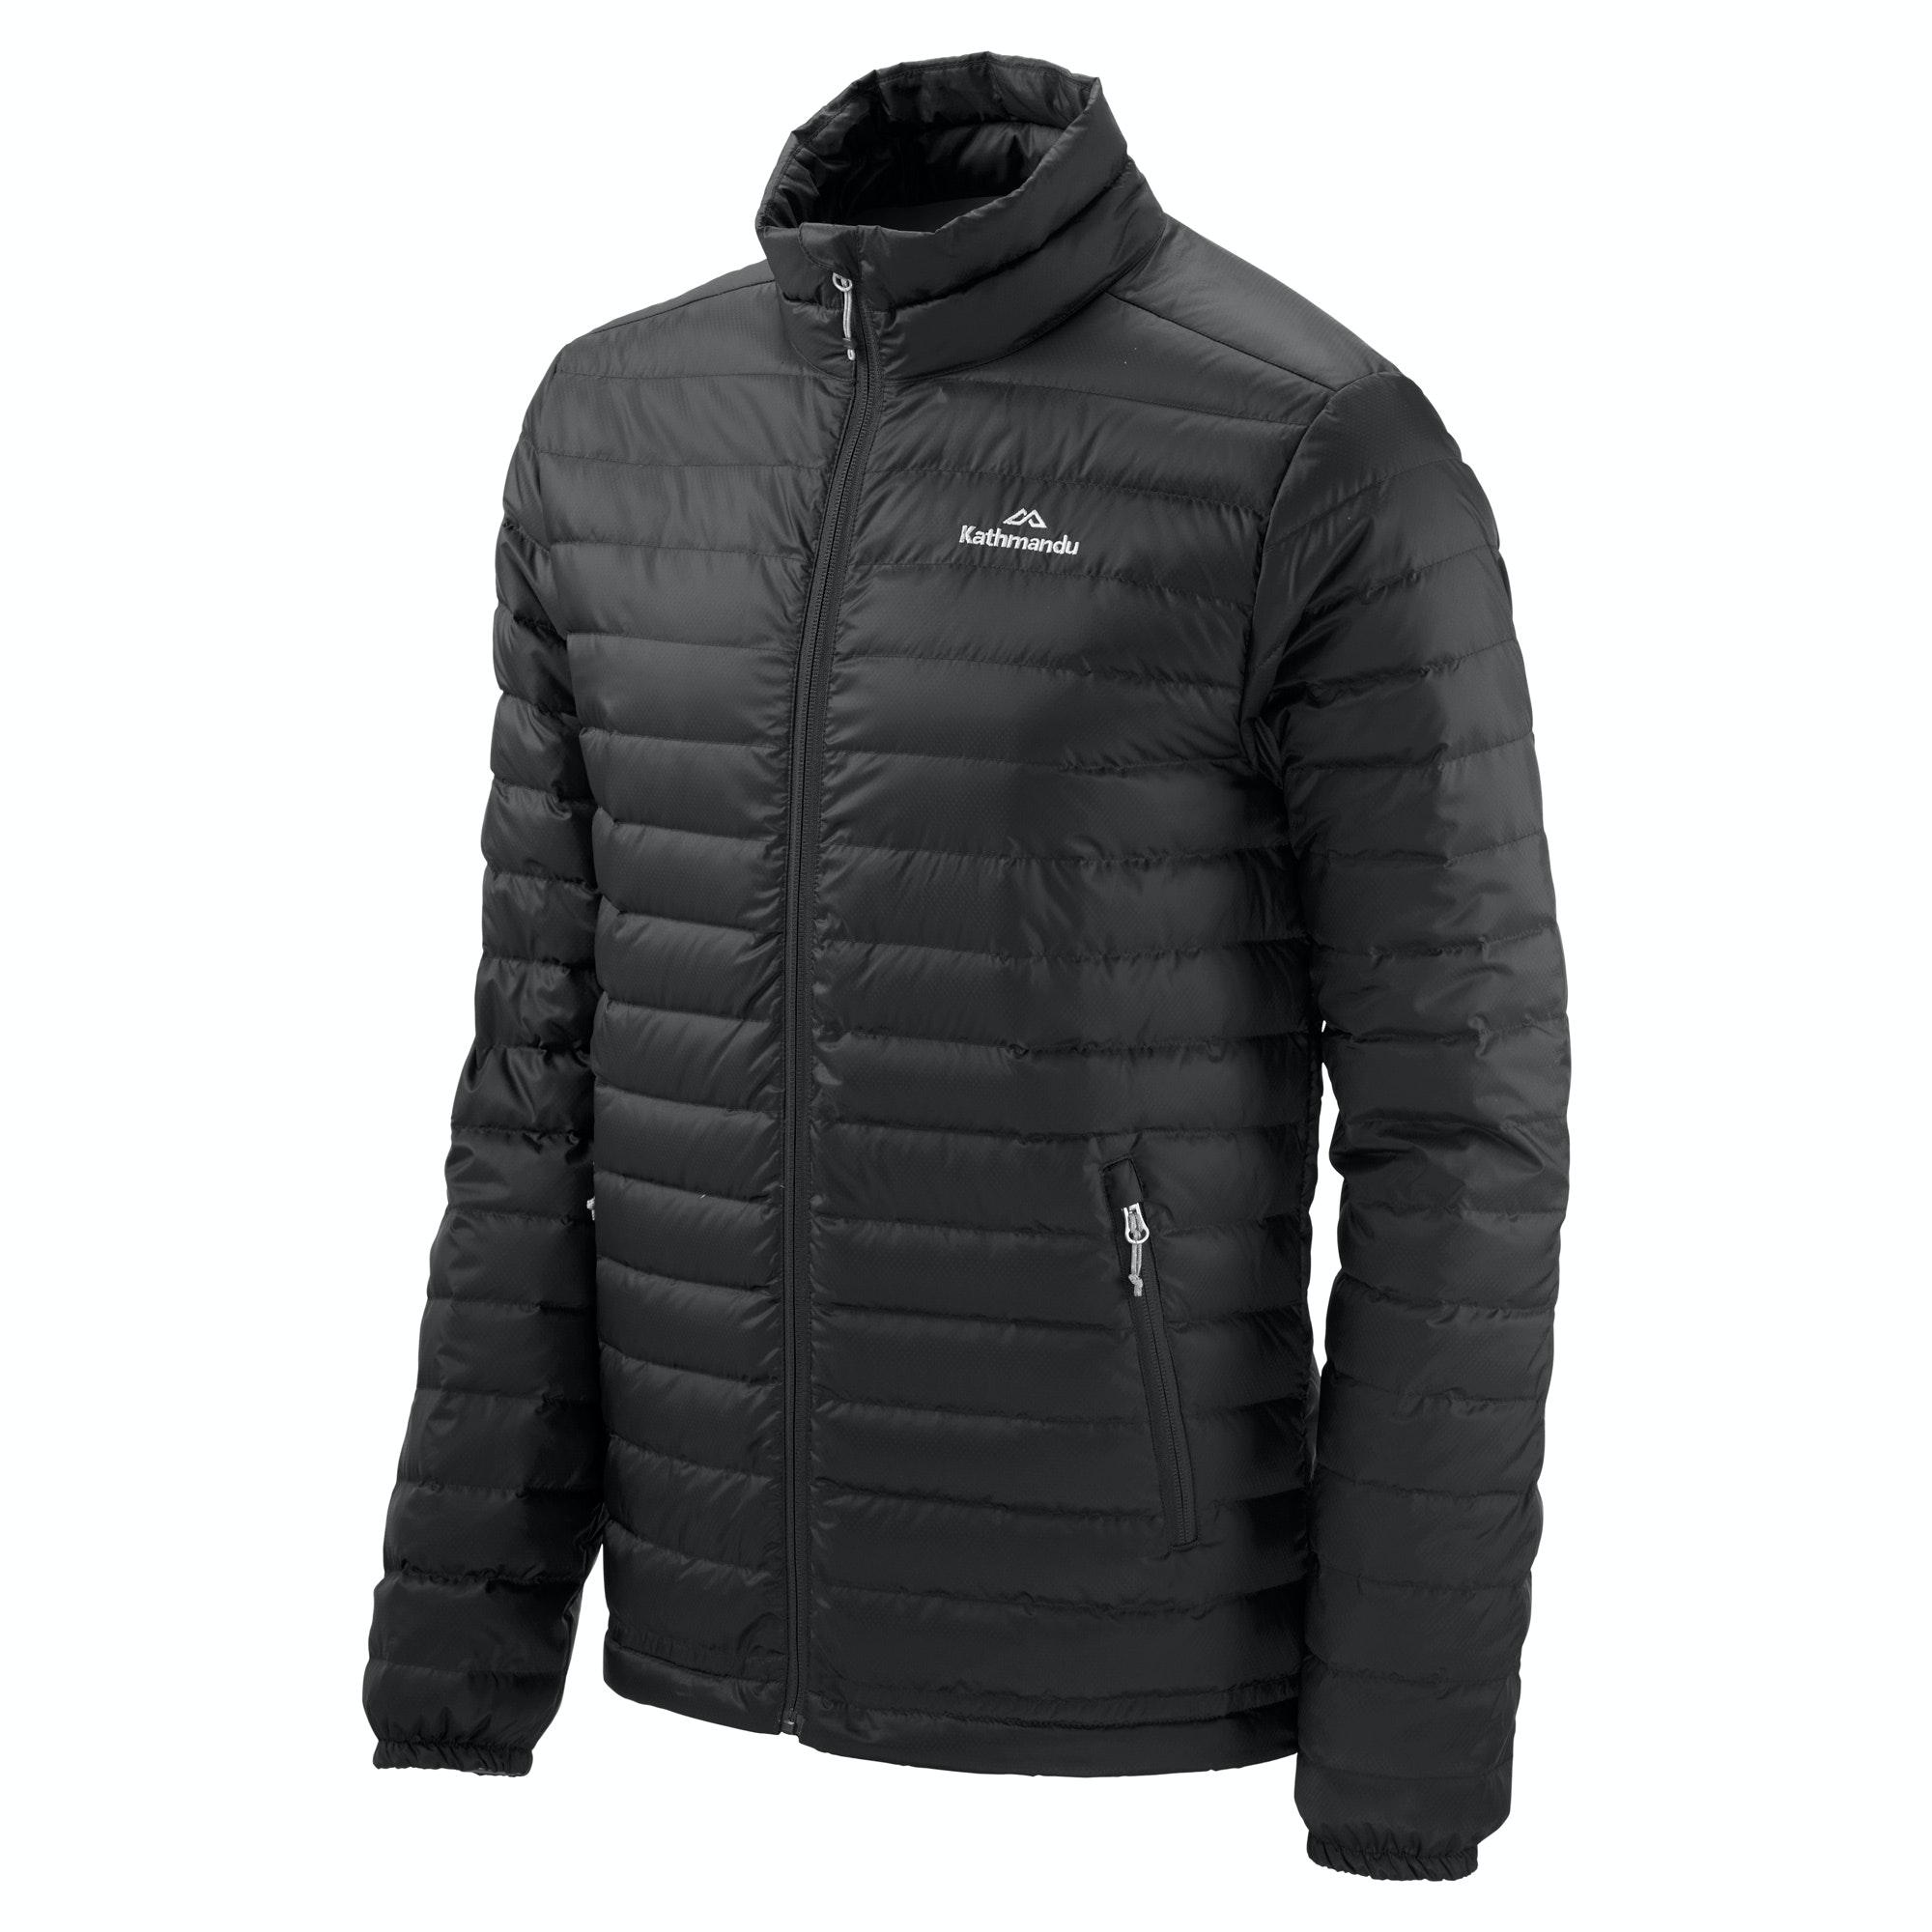 NEW-Kathmandu-Heli-Men-039-s-Lightweight-Duck-Down-Coat-Warm-Puffer-Jacket-v2 thumbnail 11